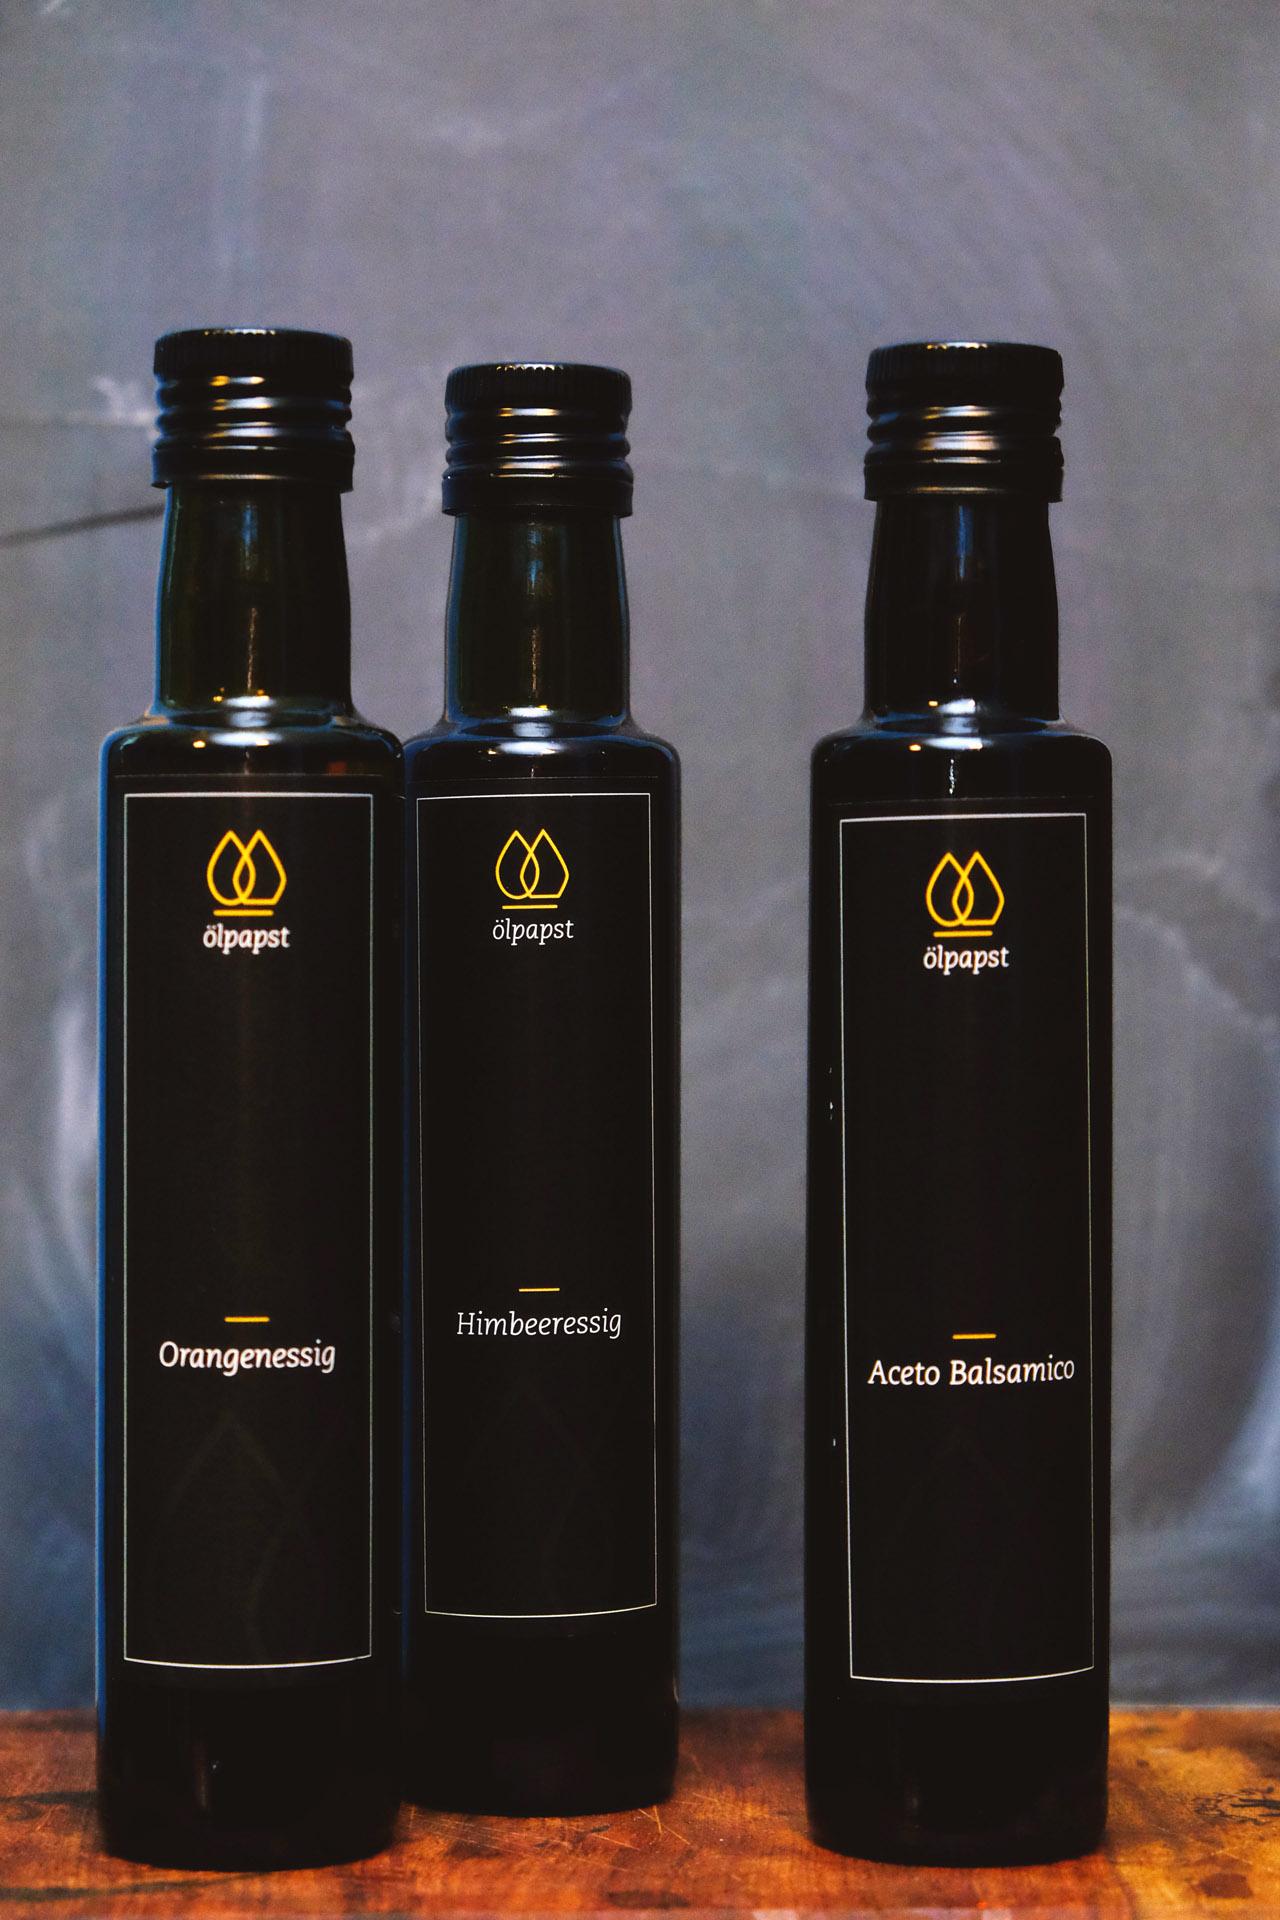 oelpapst-olivenoel-orangenessig-himbeeressig-acetobalsamico